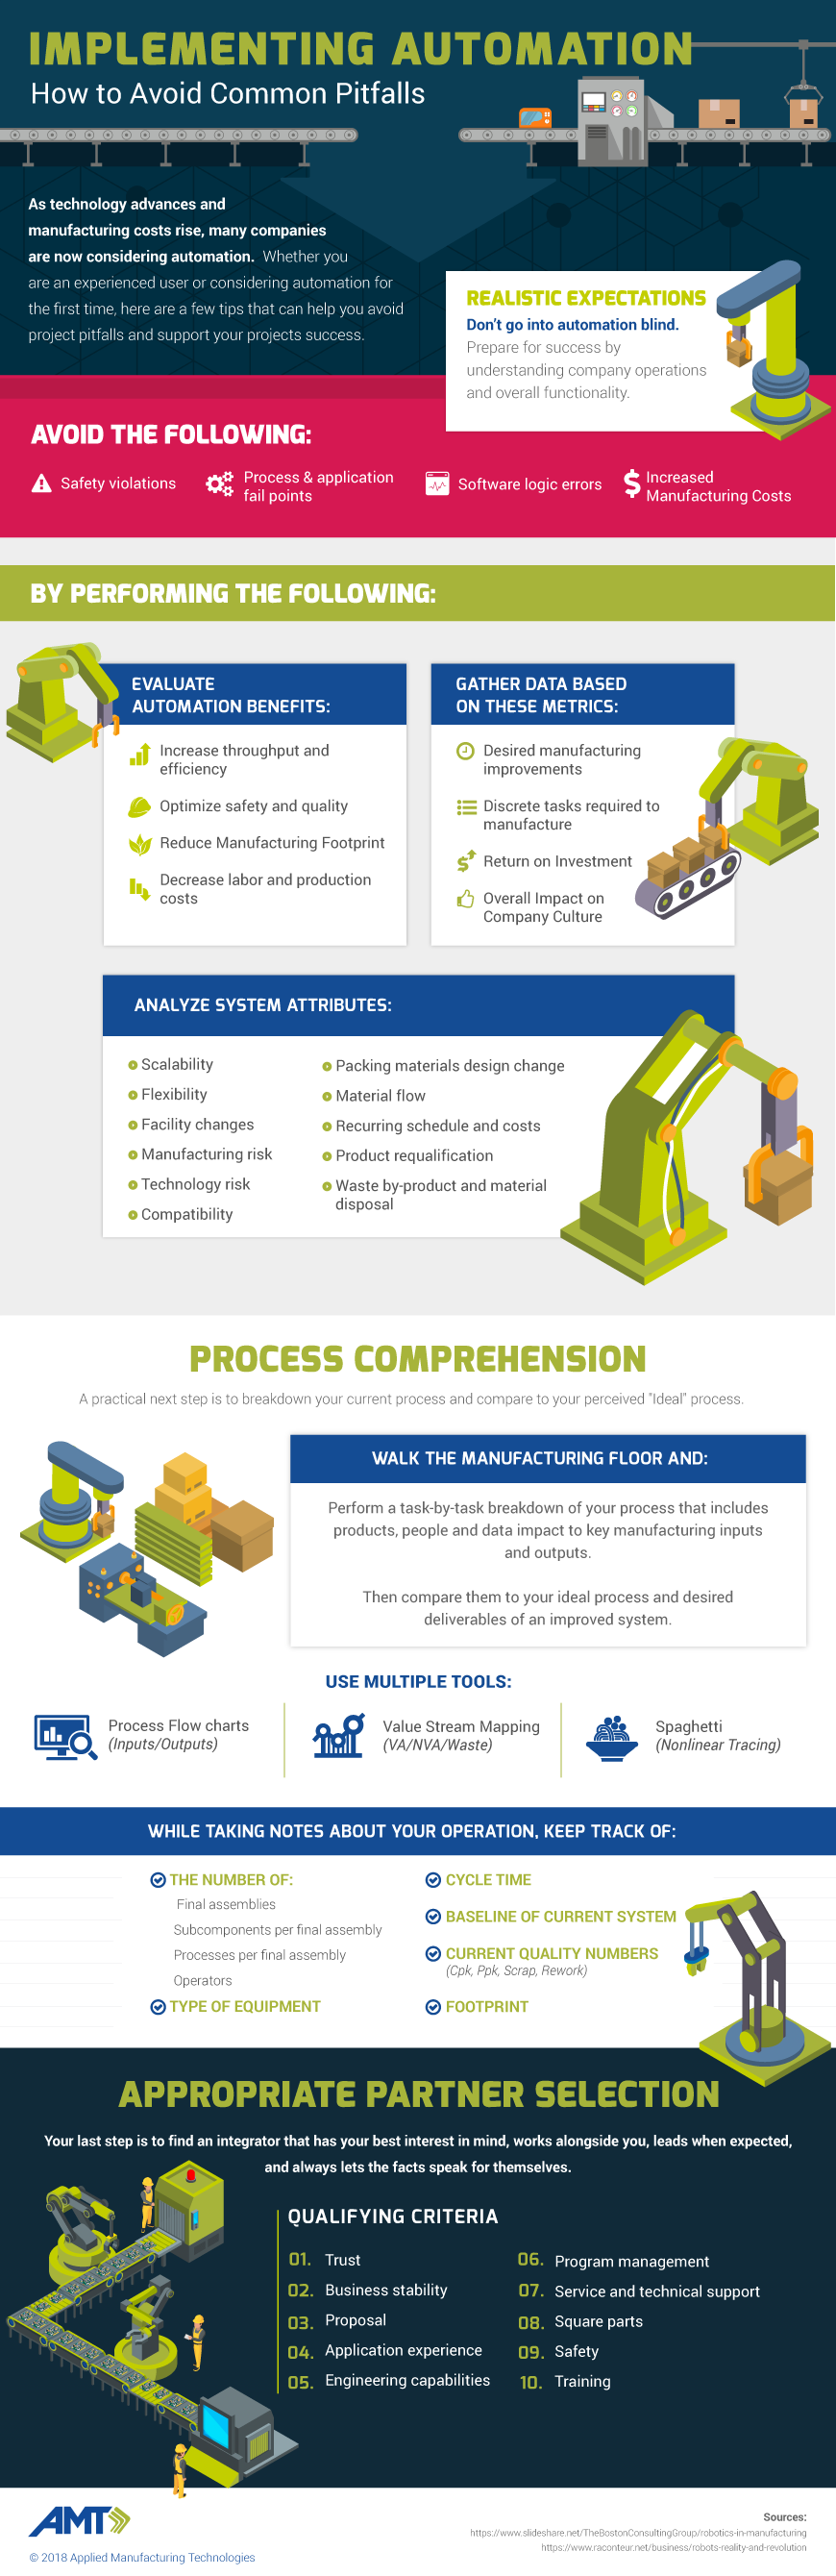 common pitfalls infographic